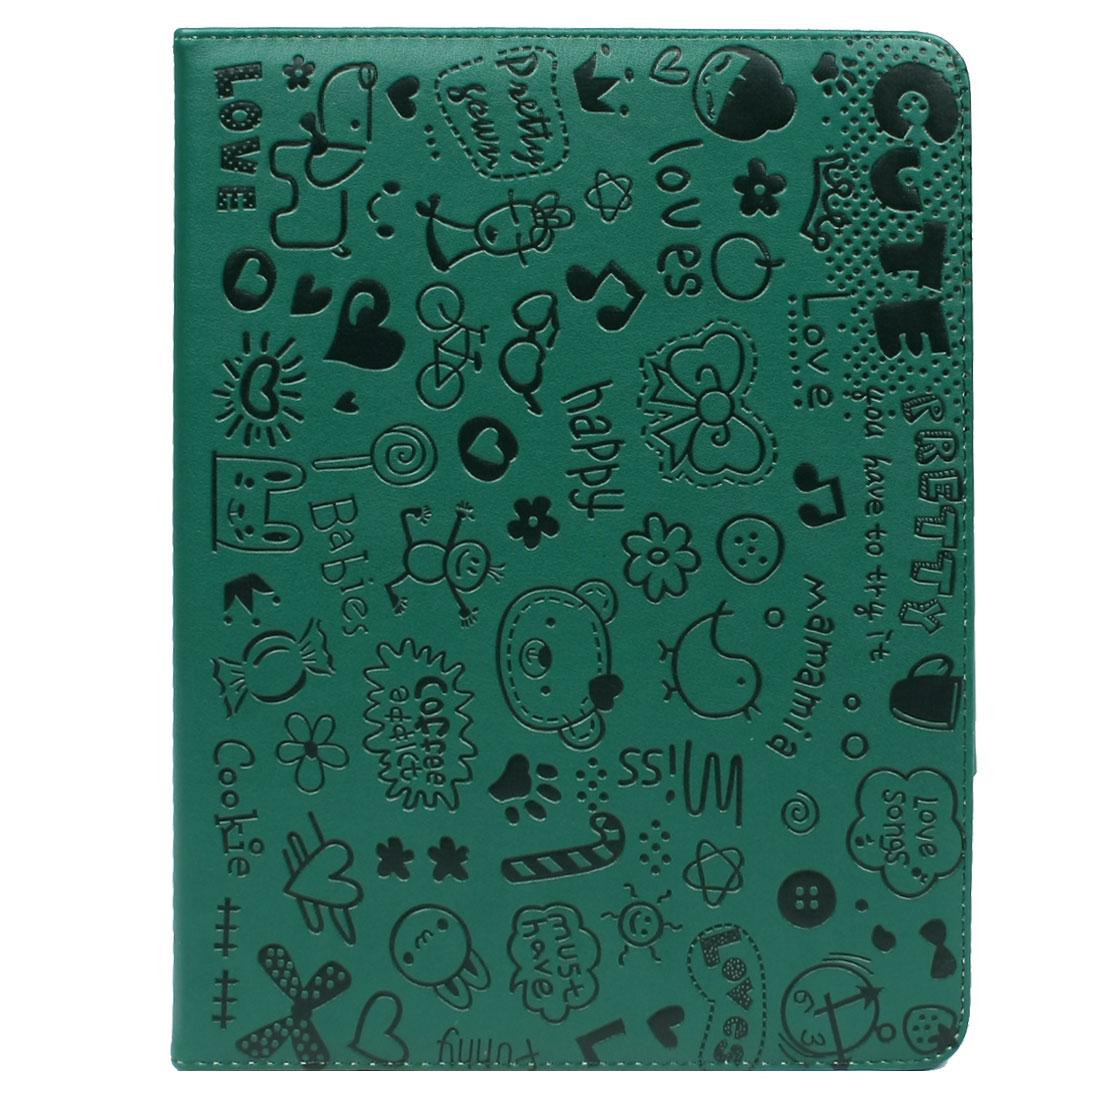 Unique Bargains Unique Bargains Green Black Animals Magnetic Coloure Tablet Stand Case Folio Cover for iPad 2 3